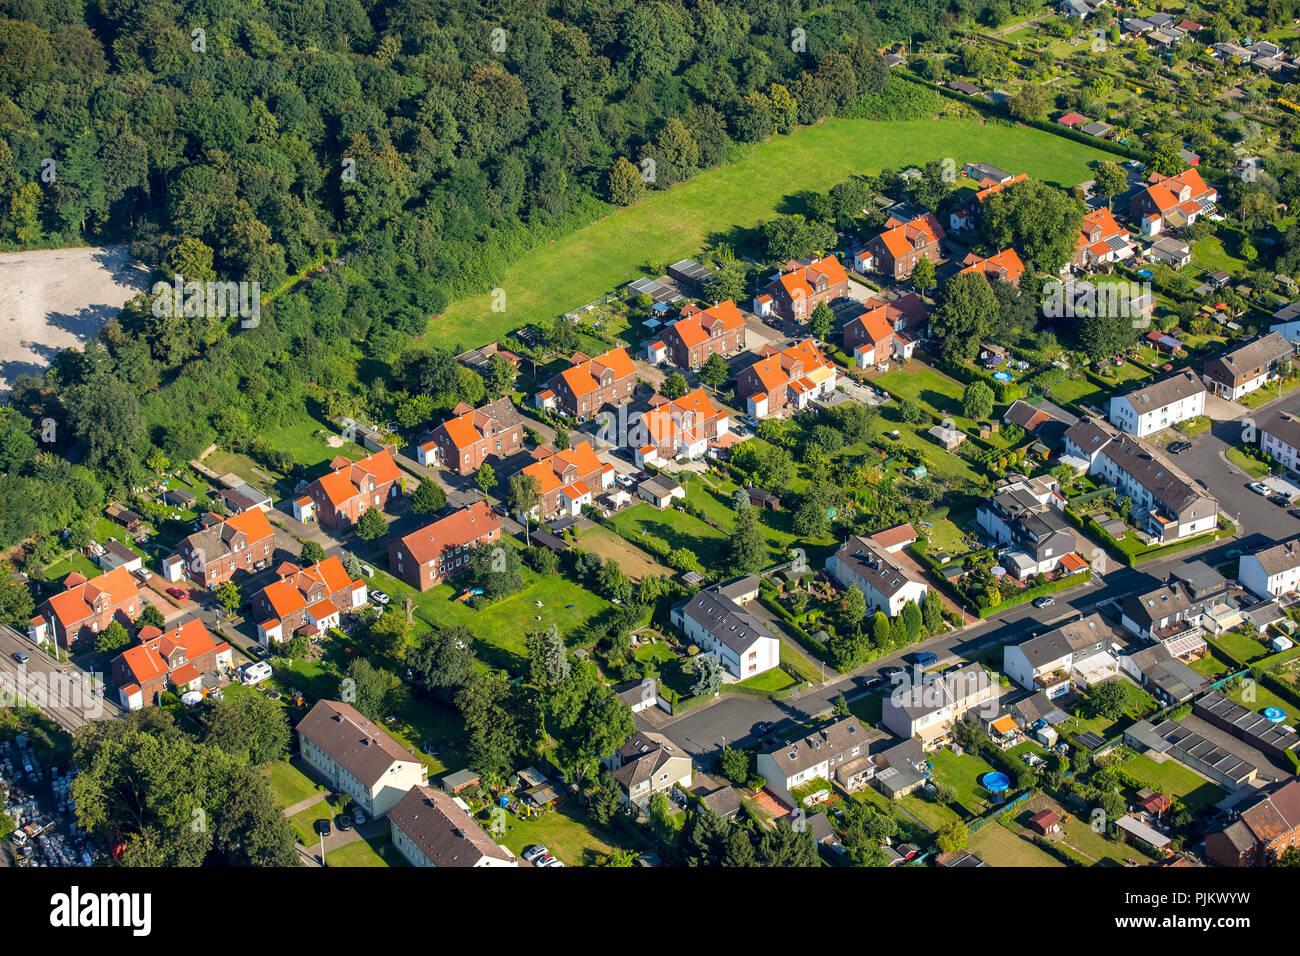 Essen-Katernberg Zollverein settlements with colony Hegemannshof, colony Ottekampshof and colony Zollverein III, Essen, Ruhr area, North Rhine-Westphalia, Germany - Stock Image